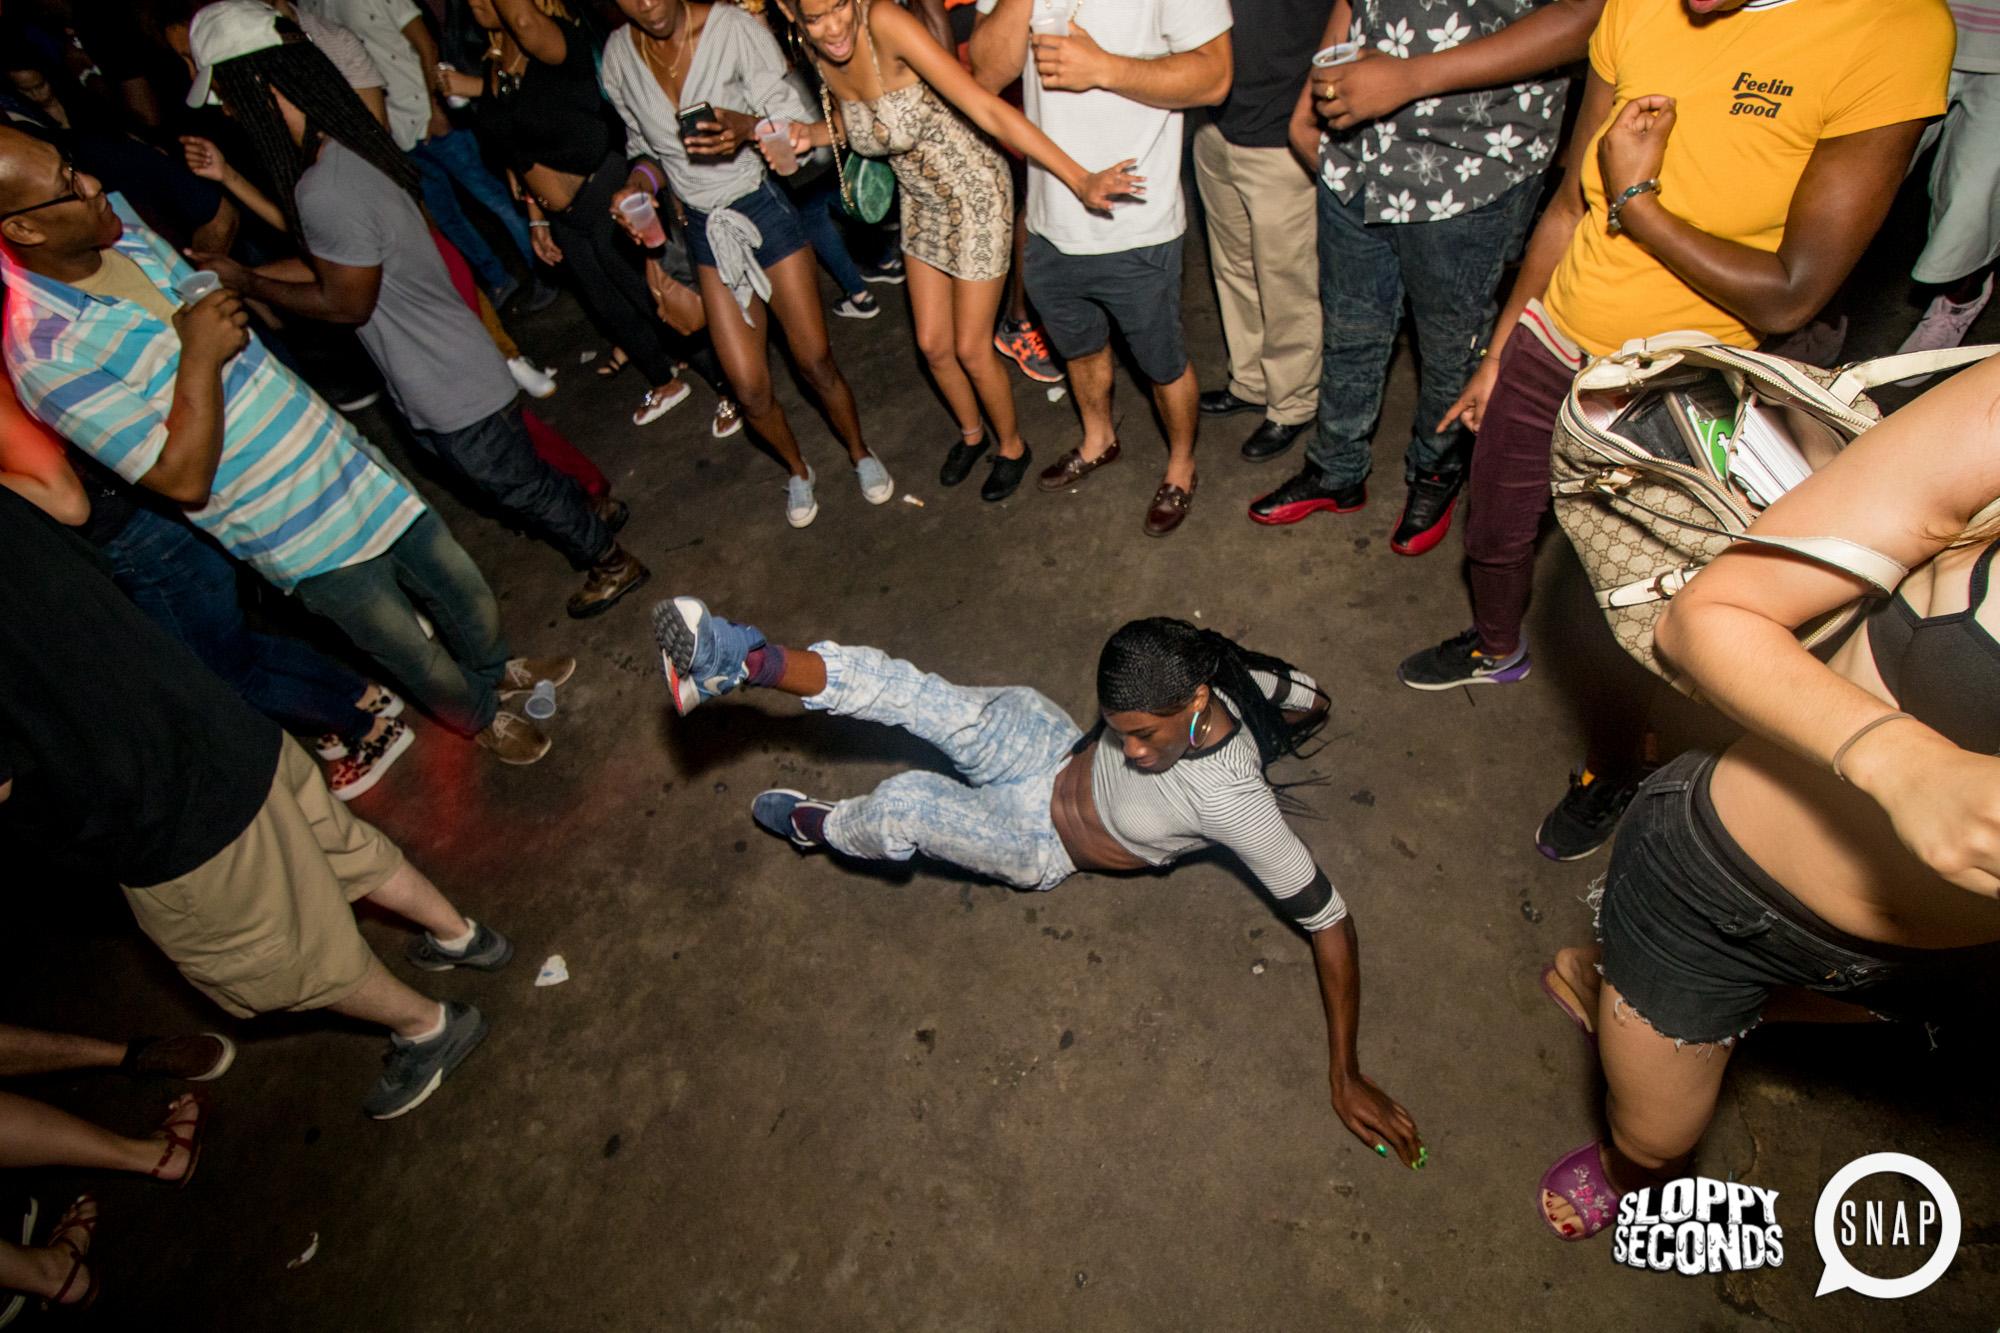 121Sloppy Seconds MJQ Atlanta Grace Kelly Oh Snap Kid.jpg